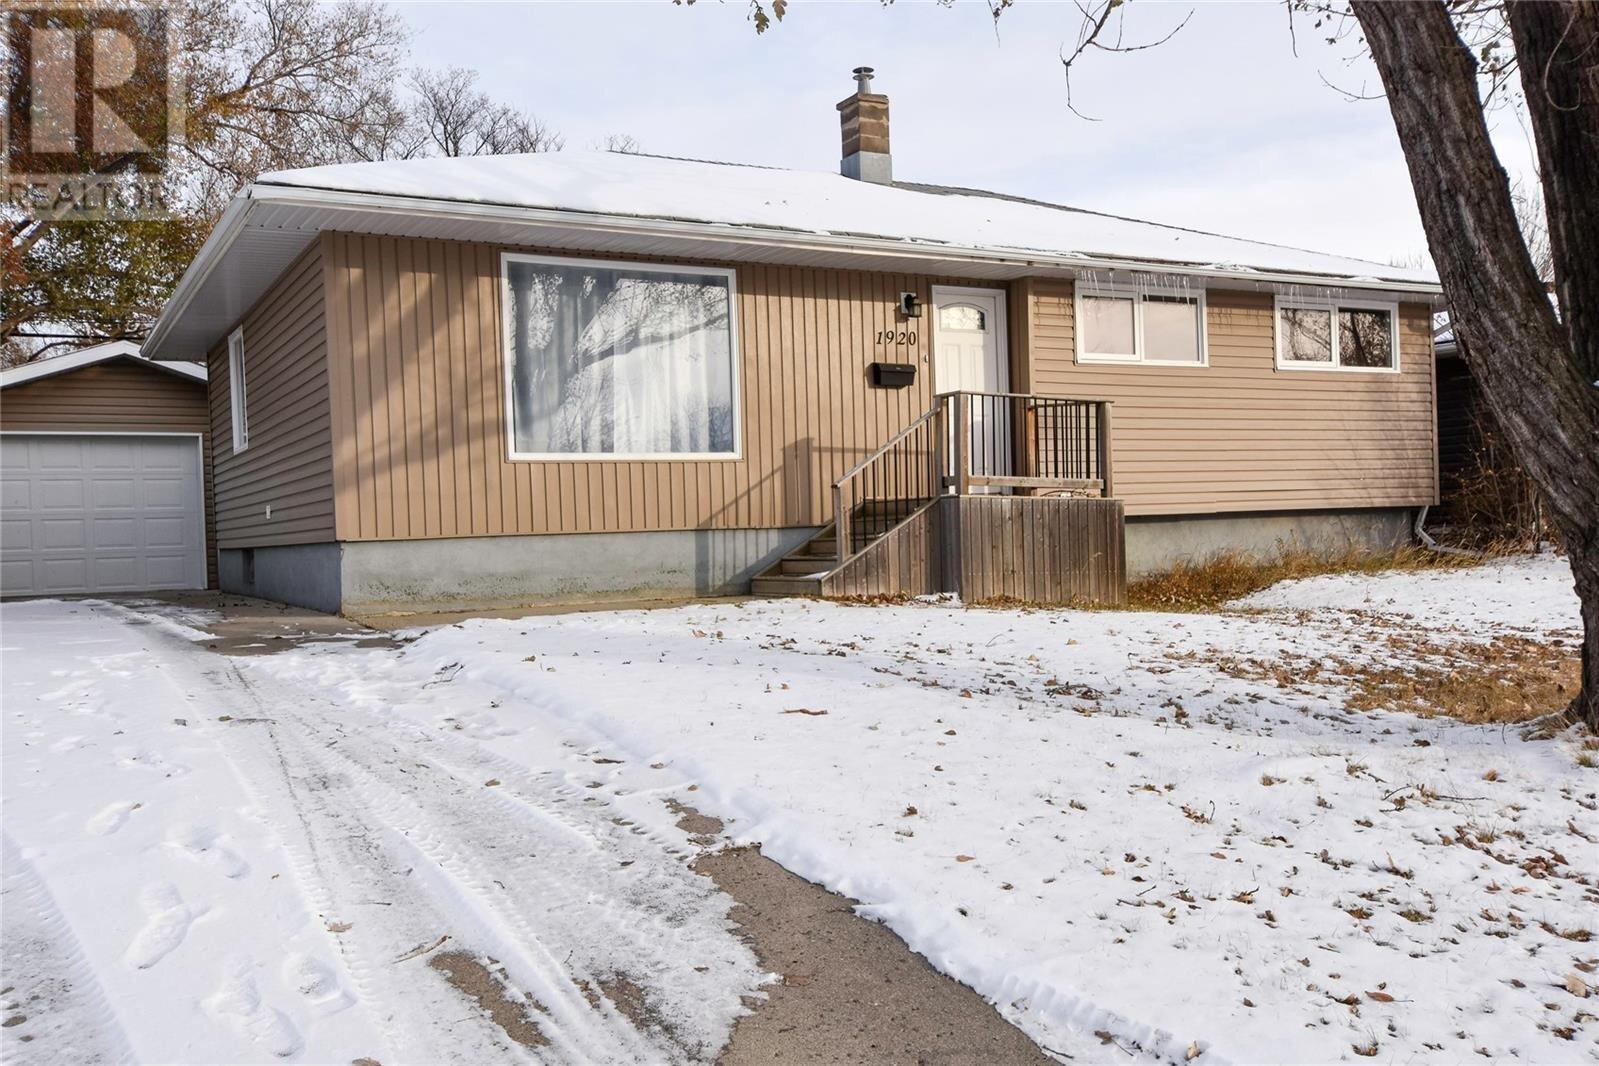 House for sale at 1920 Dyer Rd Estevan Saskatchewan - MLS: SK831469